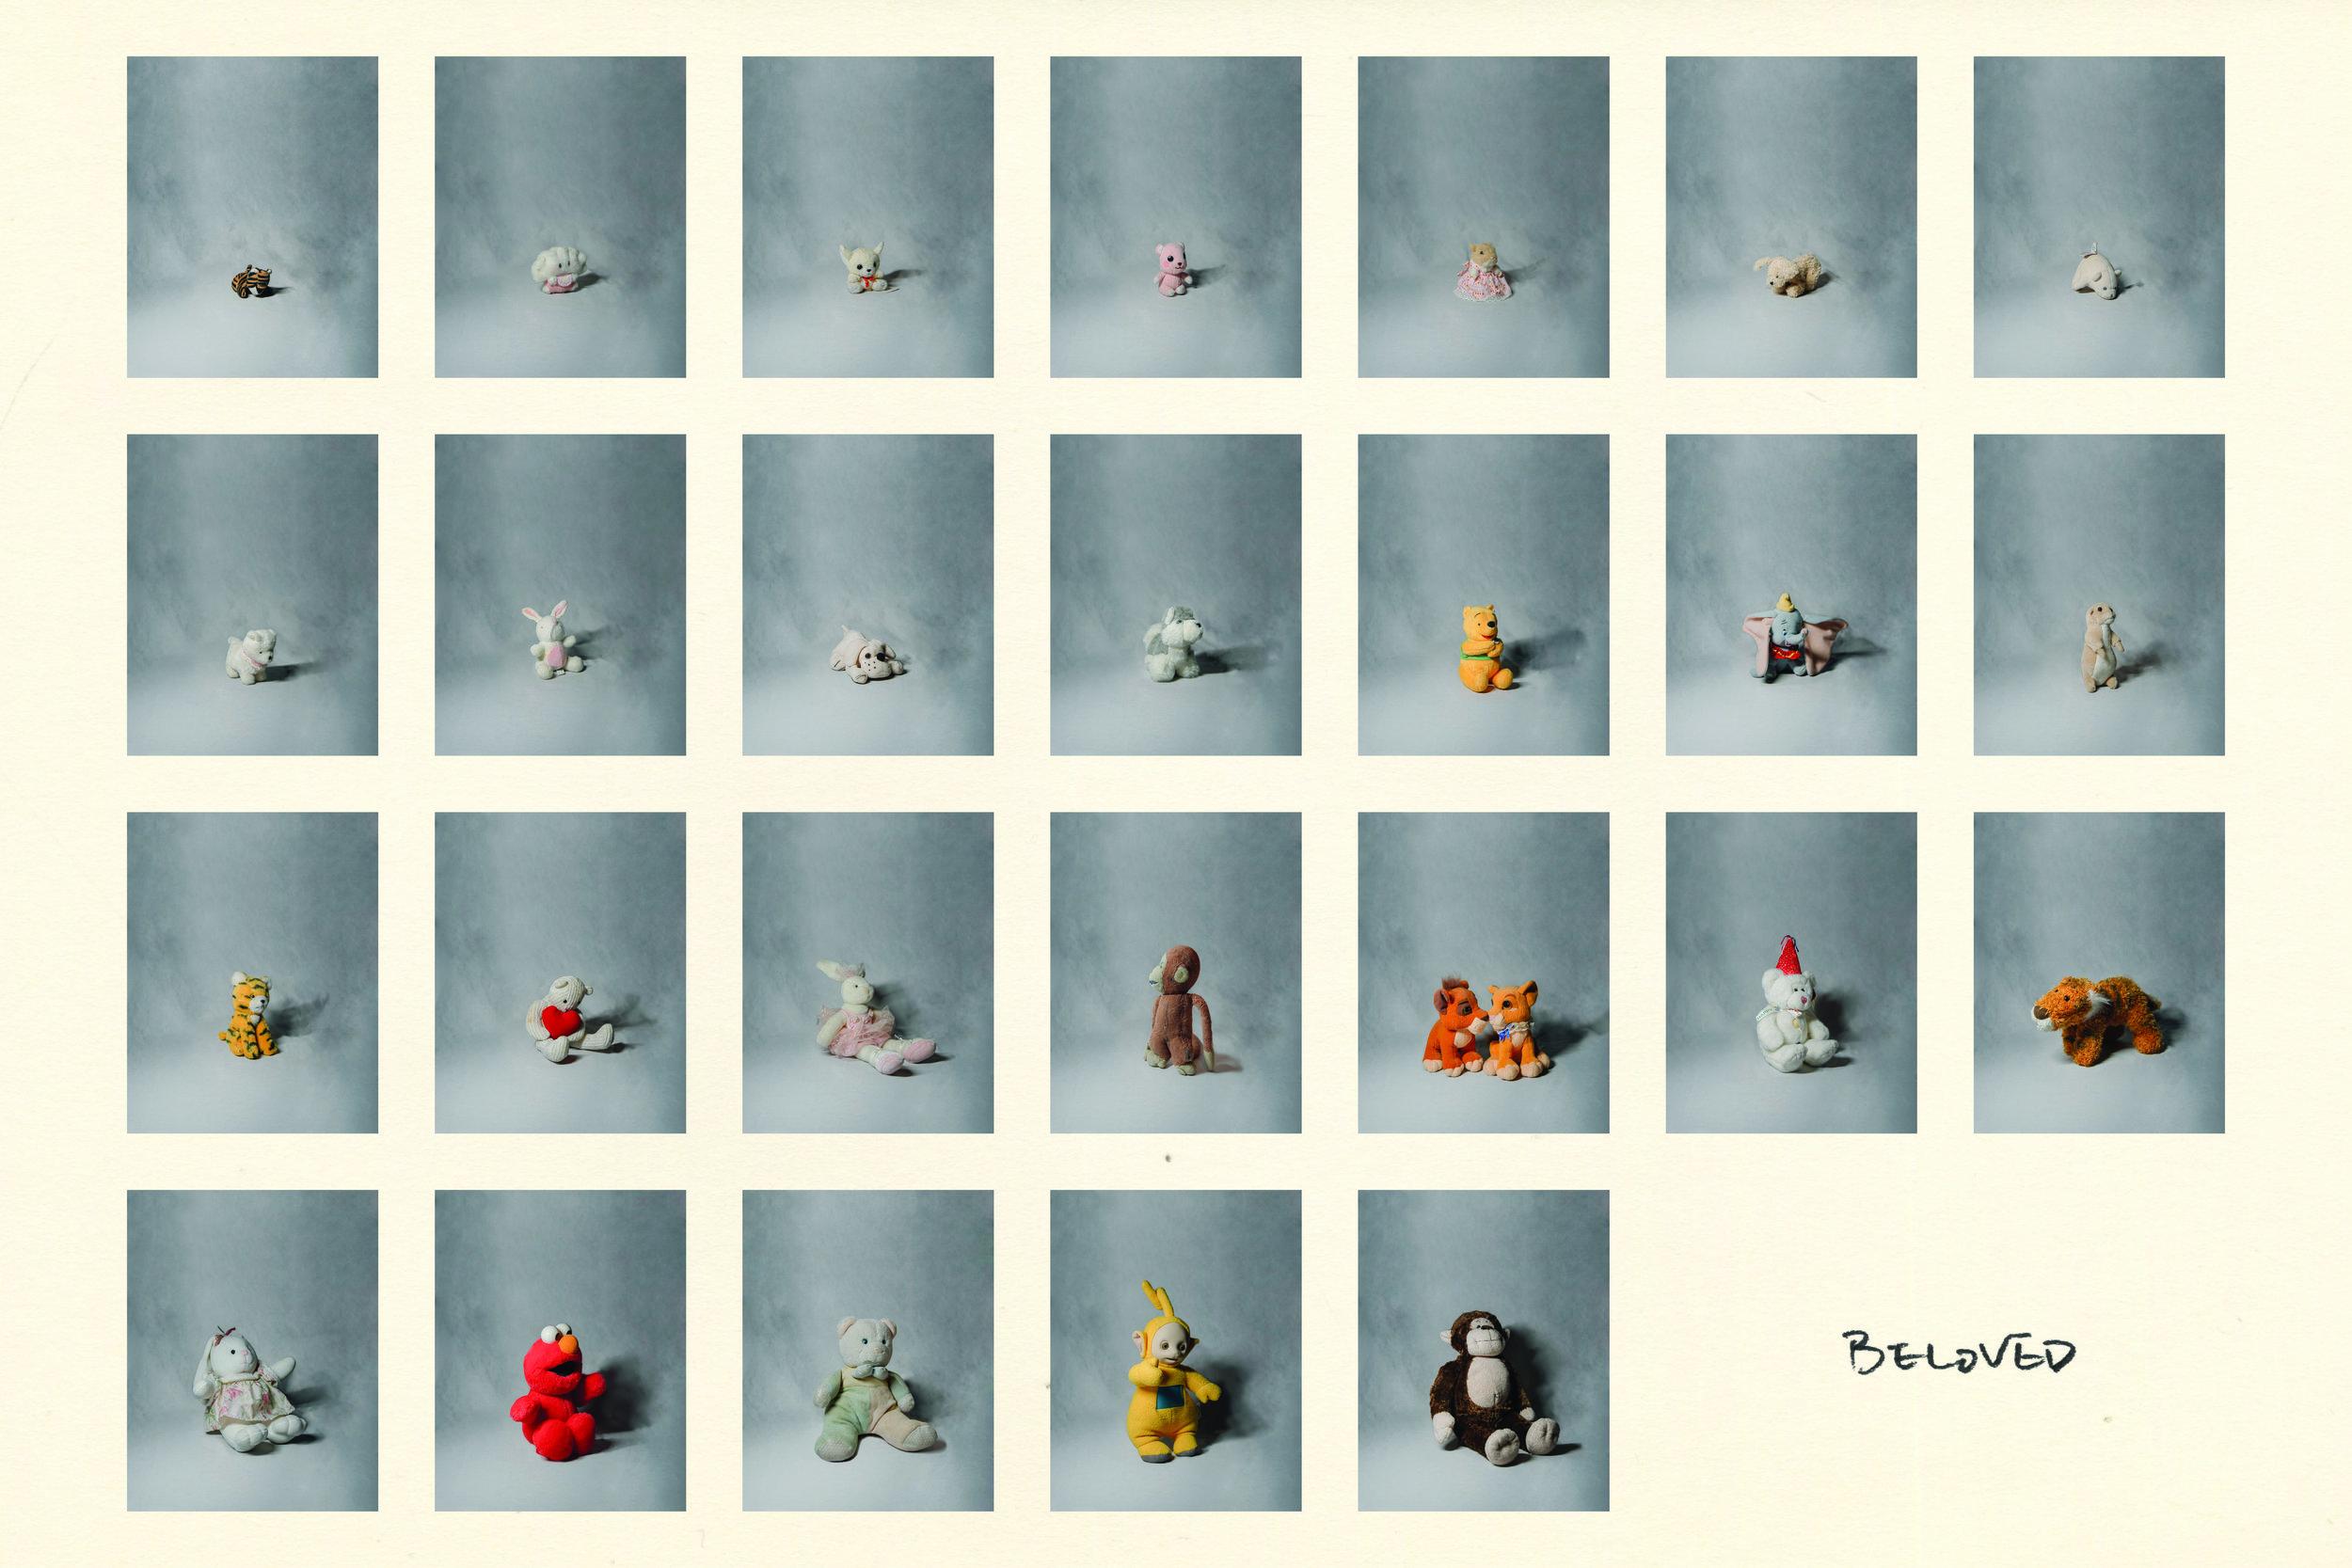 onizuka_satoe_exhibition_01.jpg